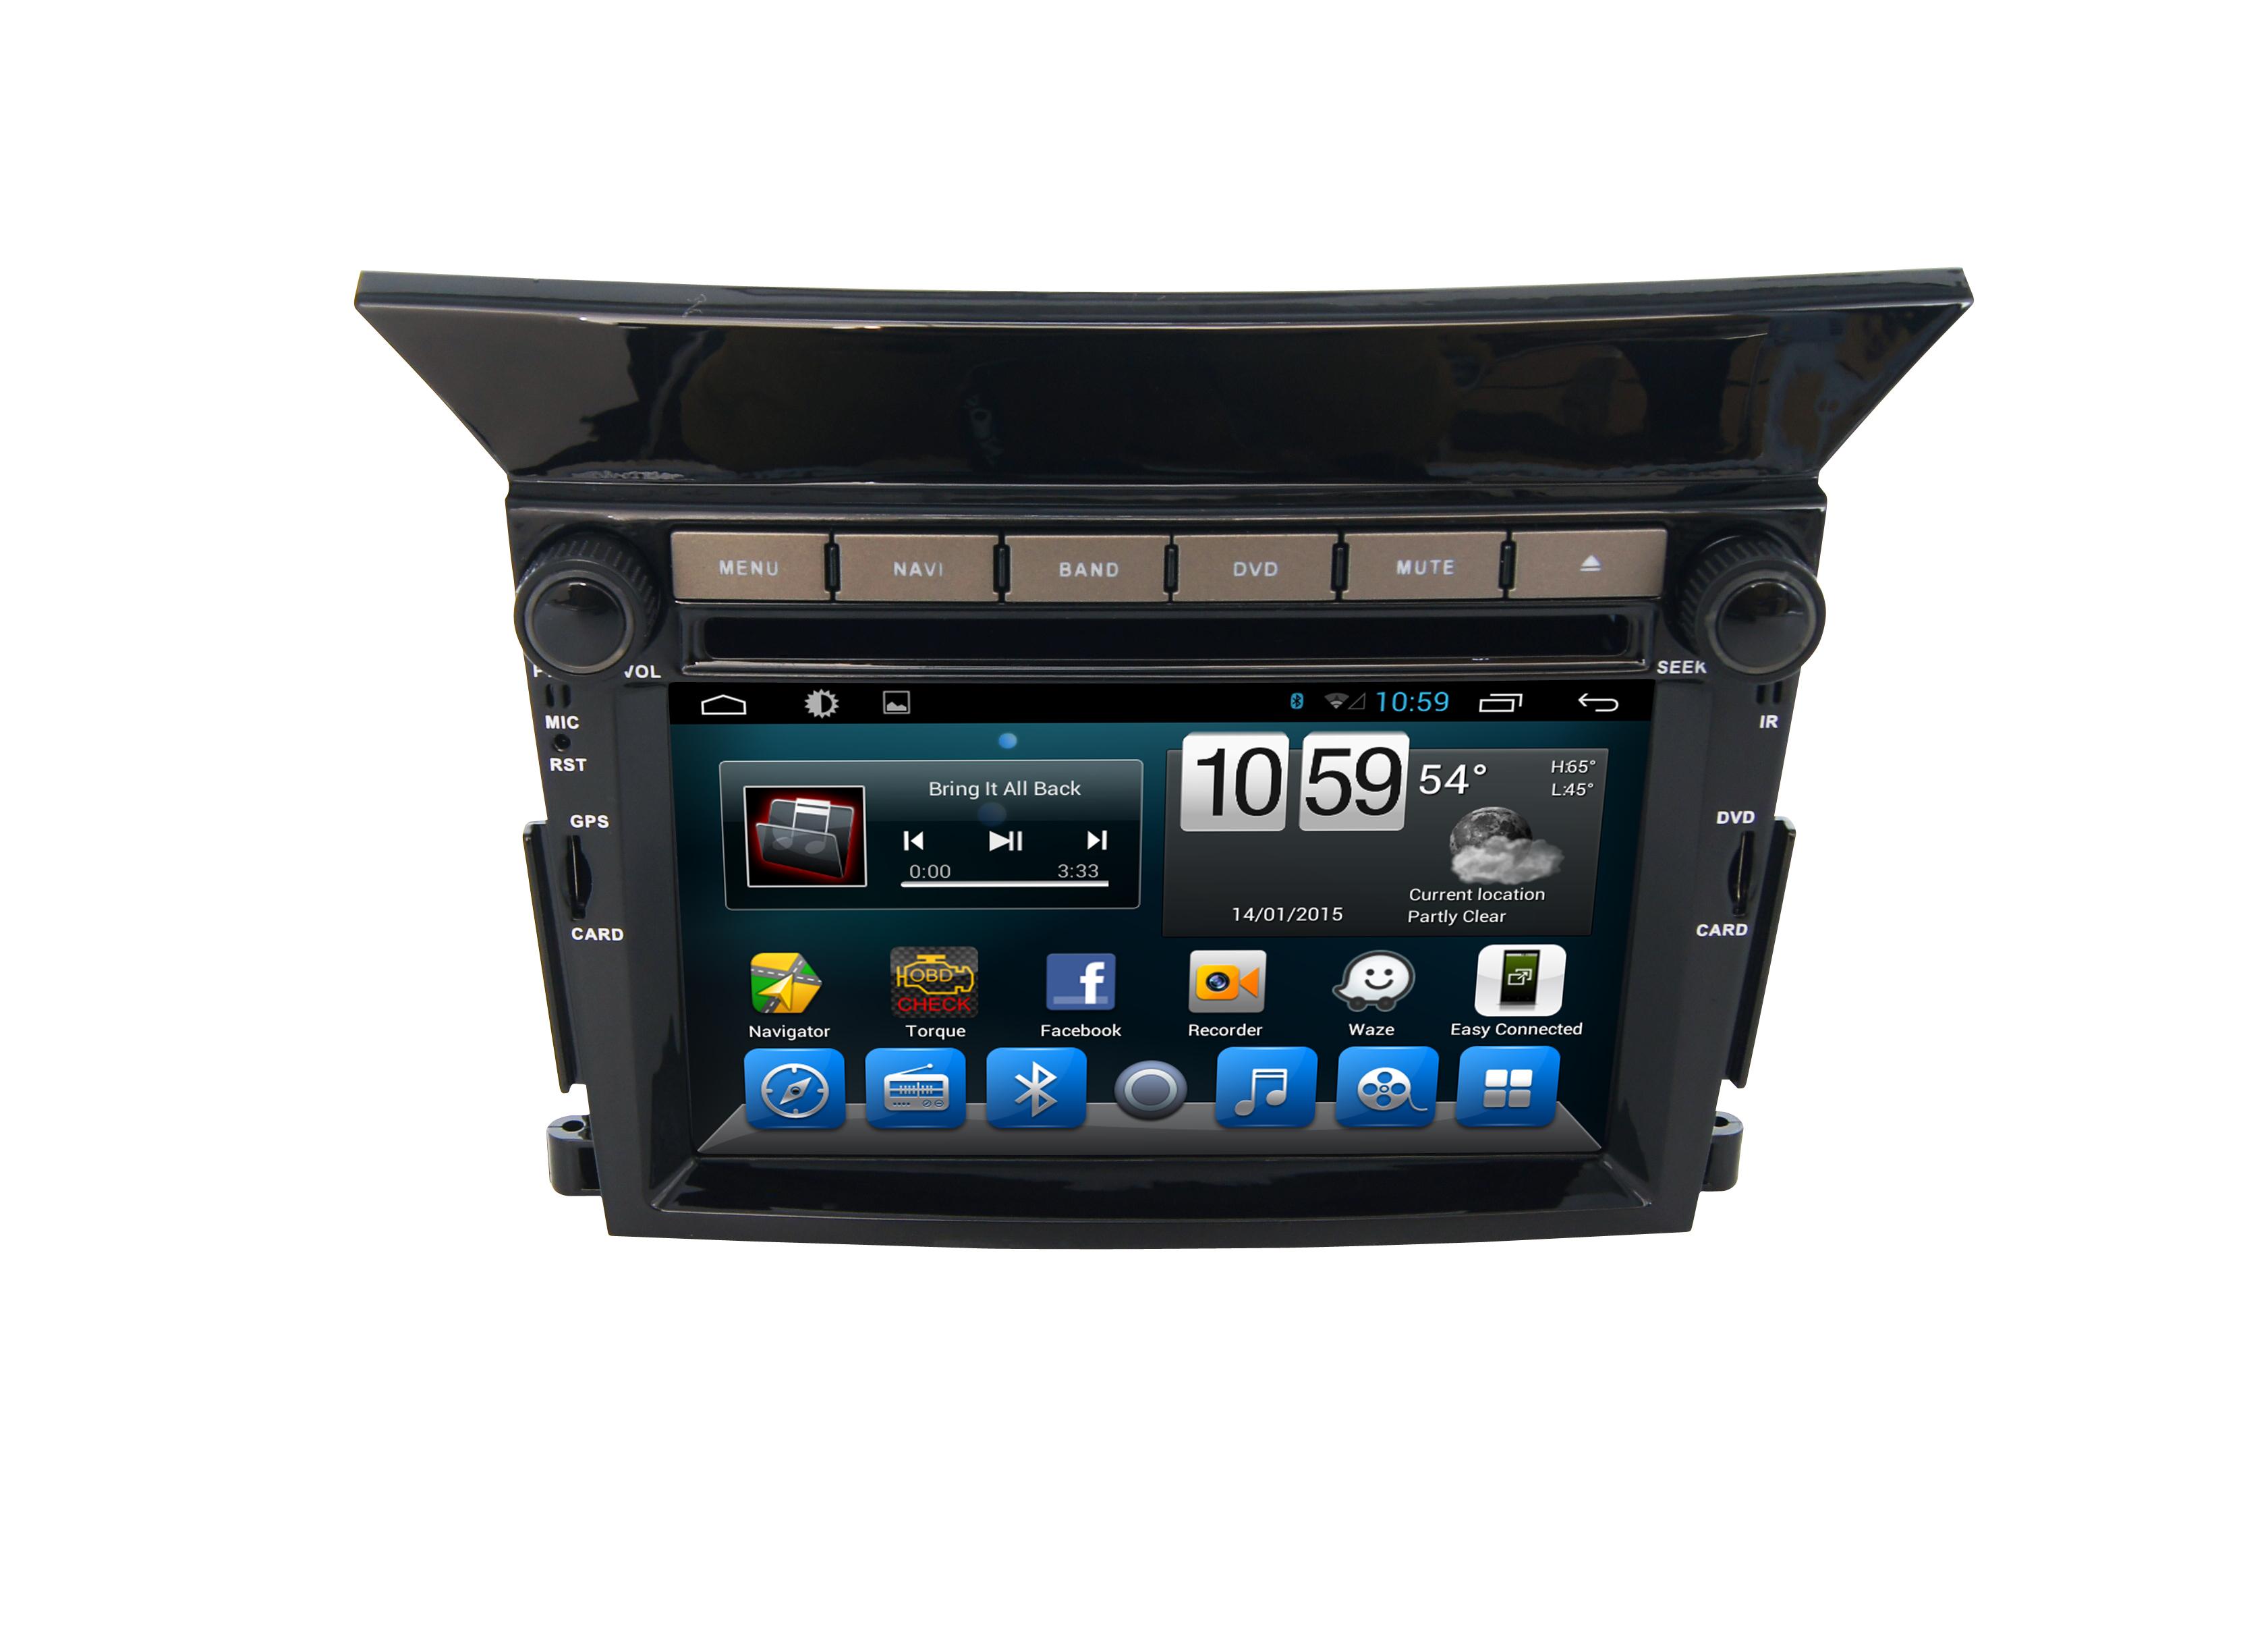 Штатная магнитола CARMEDIA KR-6225-T8 для Honda Pilot 2008-2015 Android 7.1.2 штатная магнитола carmedia dabt 3706 dvd honda pilot 2008 2015